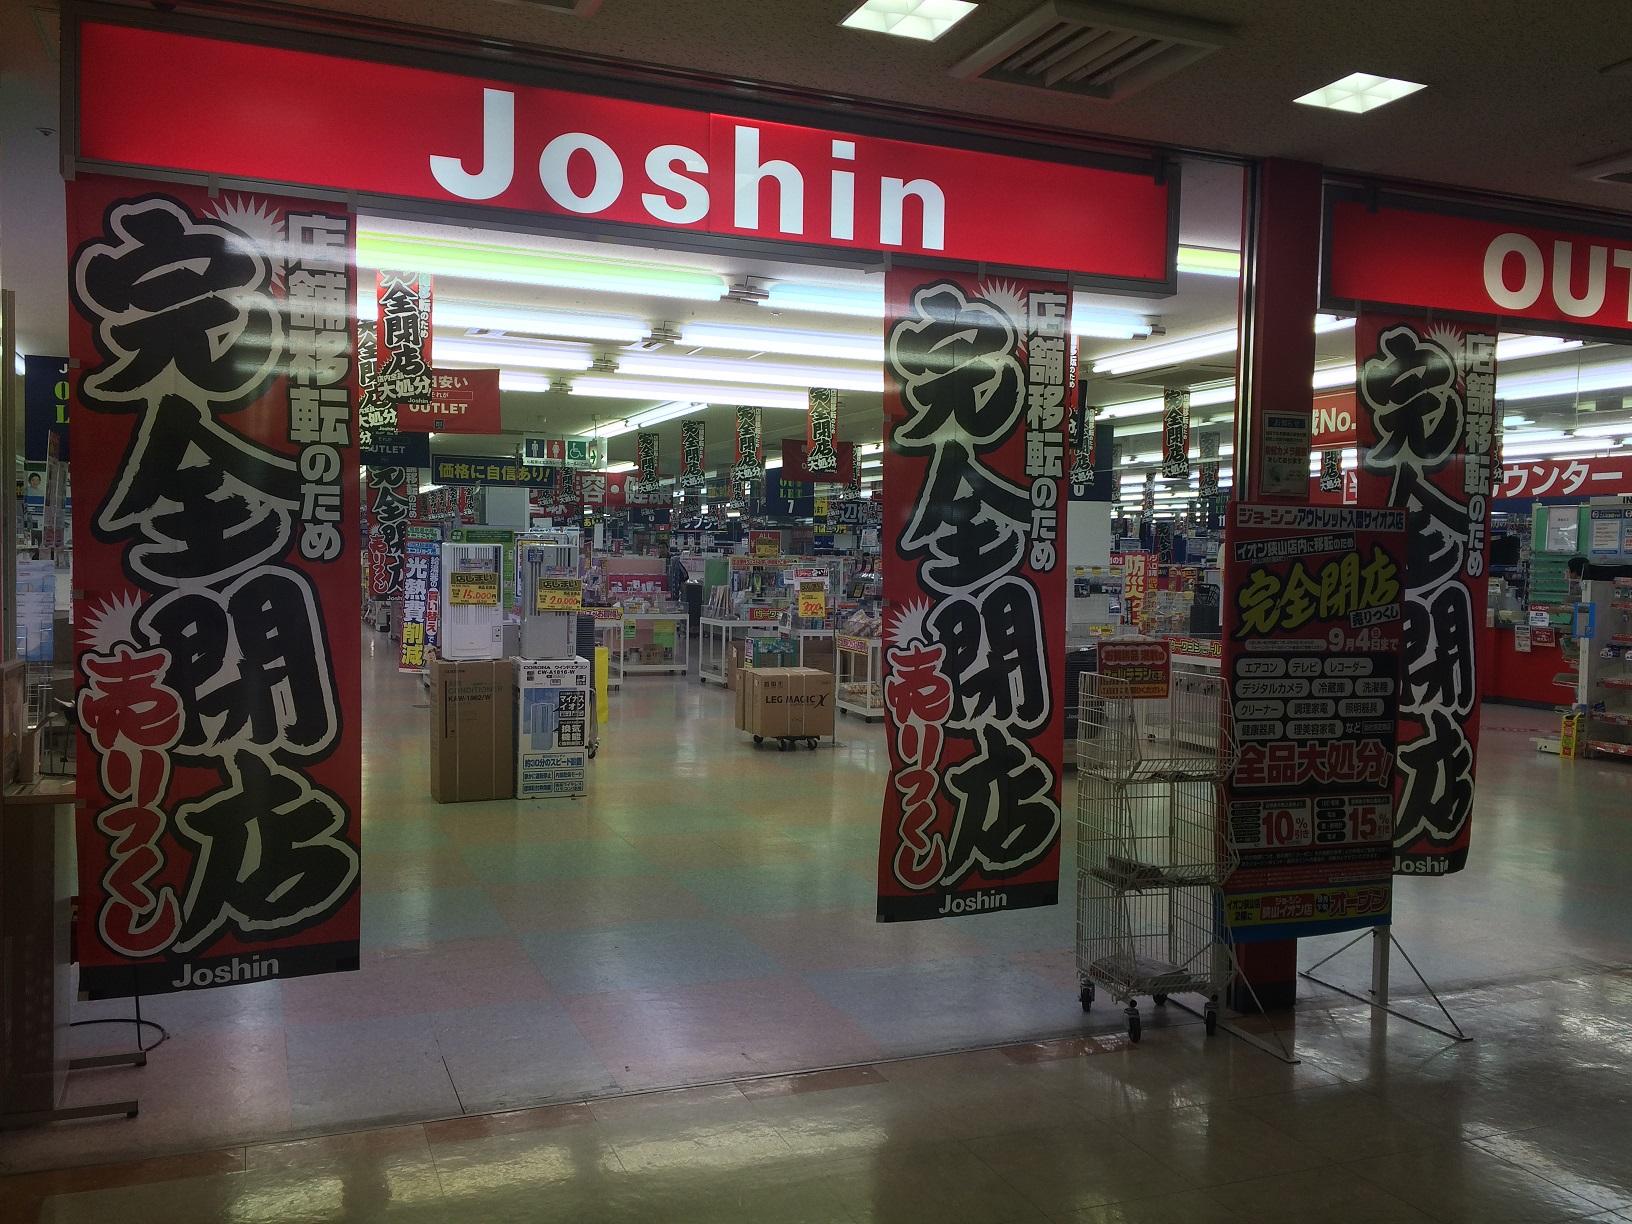 Joshin電機アウトレット店閉店セール